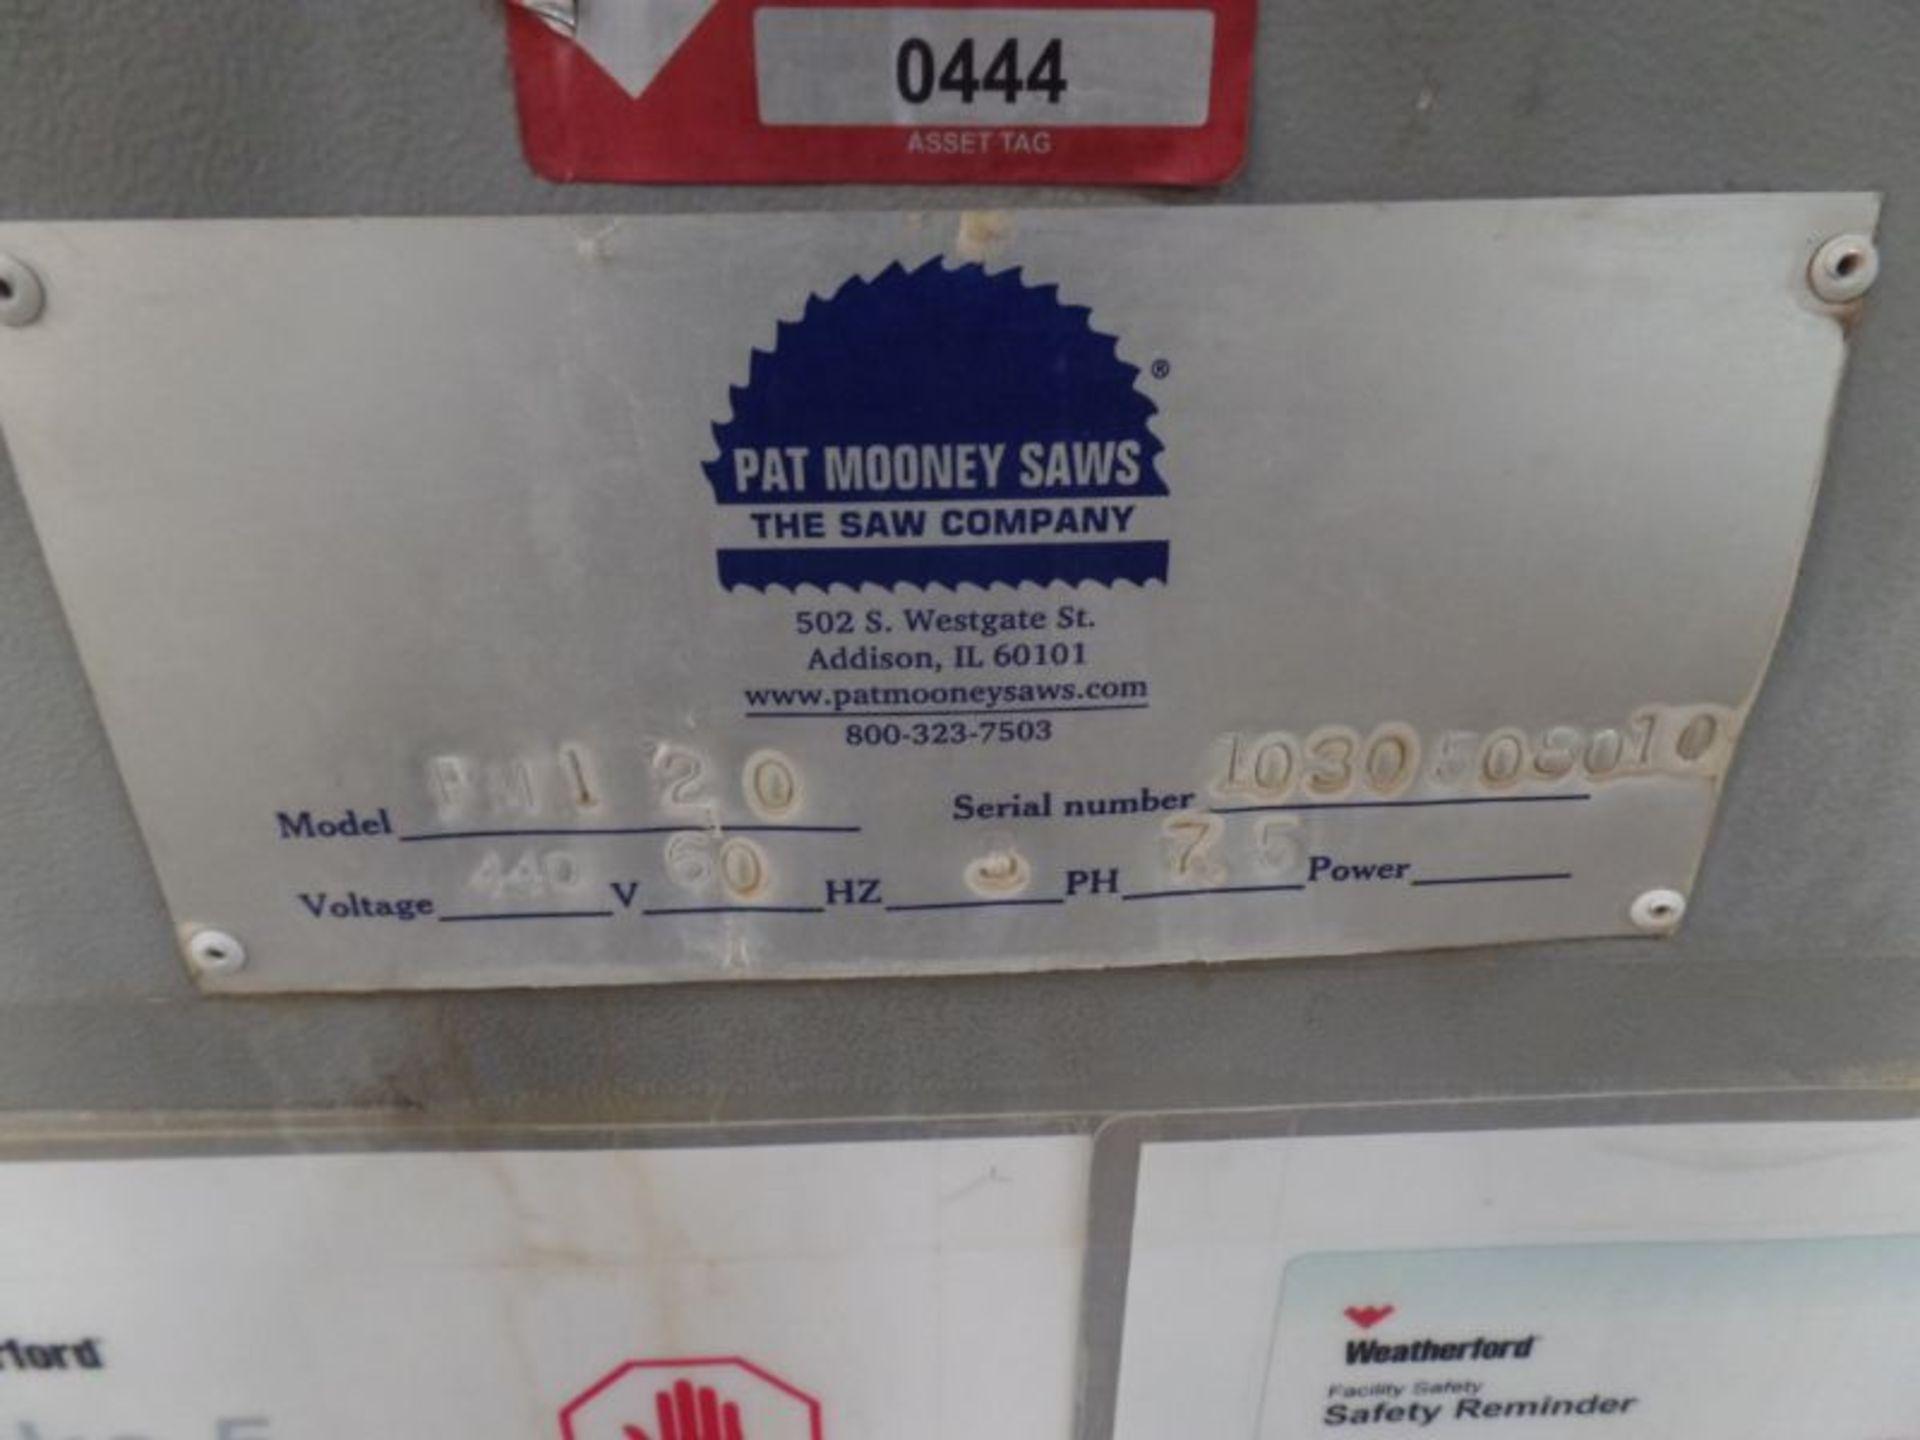 "Pat Mooney PMI-20 Mitering Upcut Saws, 24"" Blade, 7.5 HP, s/n 1030508010 - Image 6 of 6"